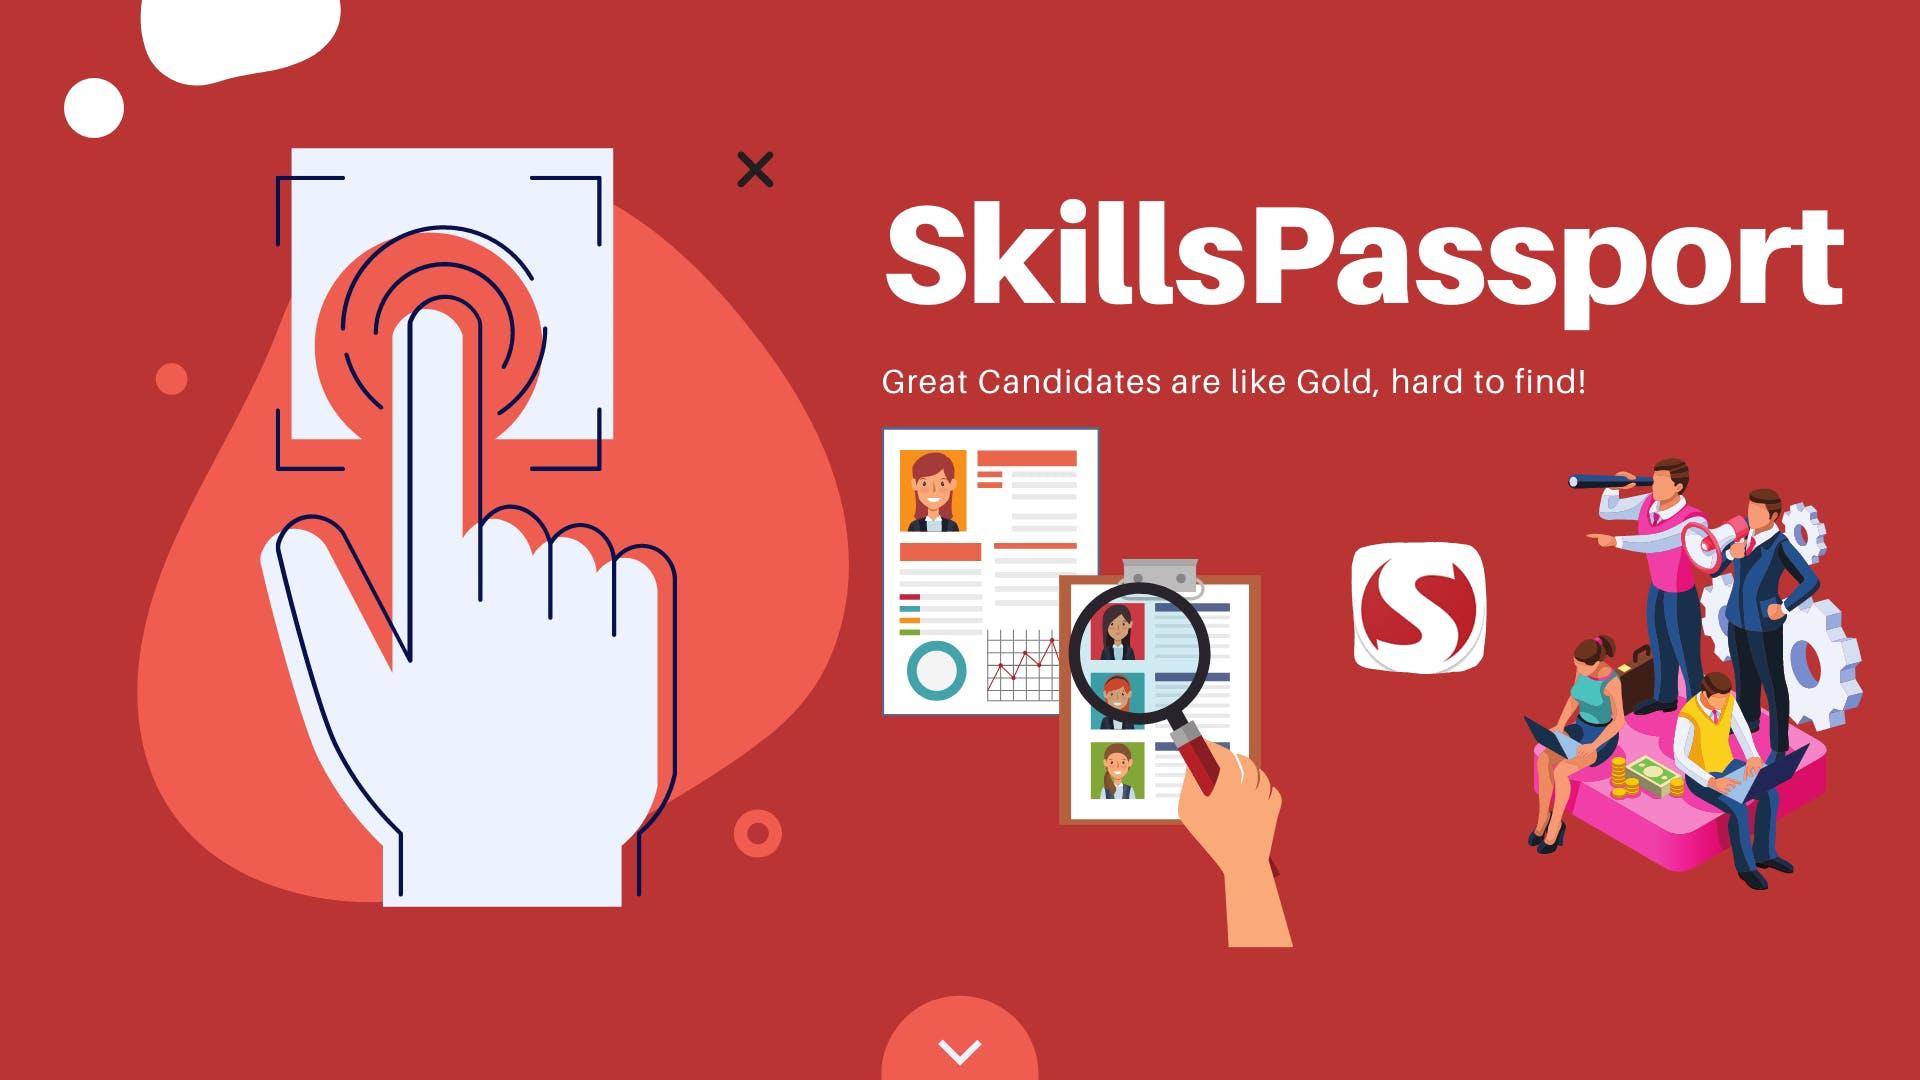 SkillsPassport